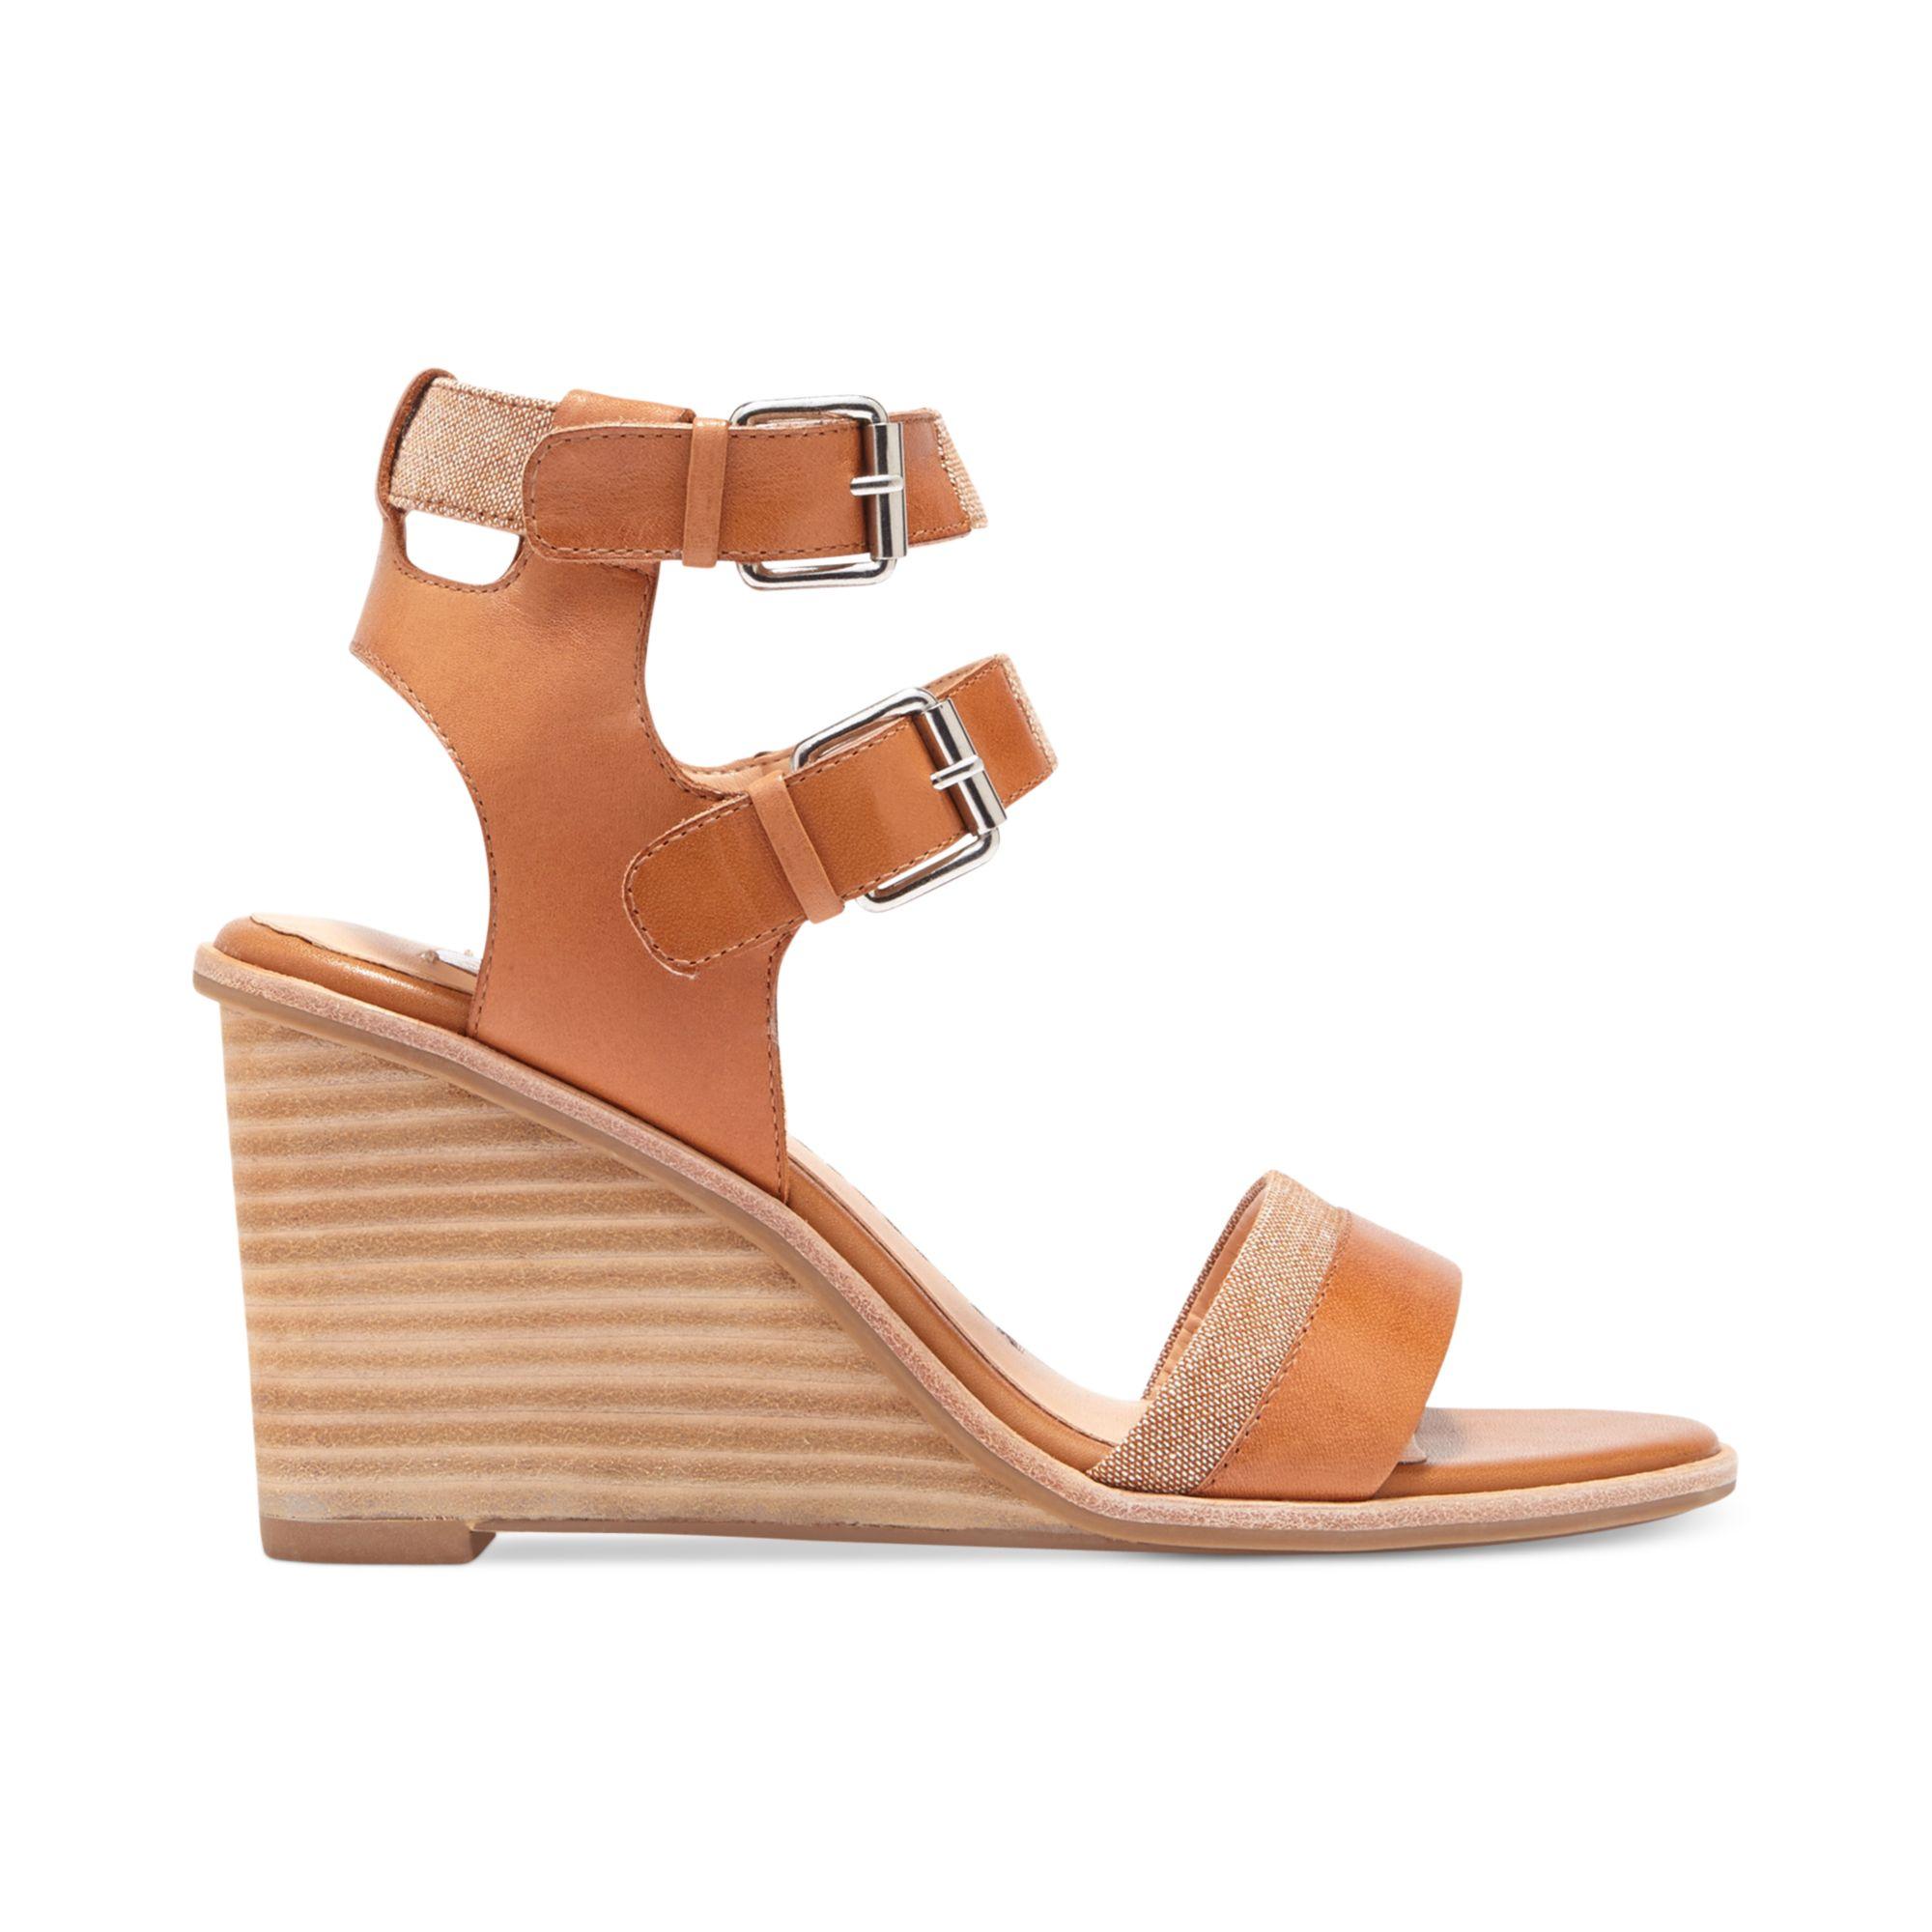 Dv Dolce Vita Tulle Espadrille Wedge Sandals: Dolce Vita Dv By Cassie Wedge Sandals In Brown (Honey)